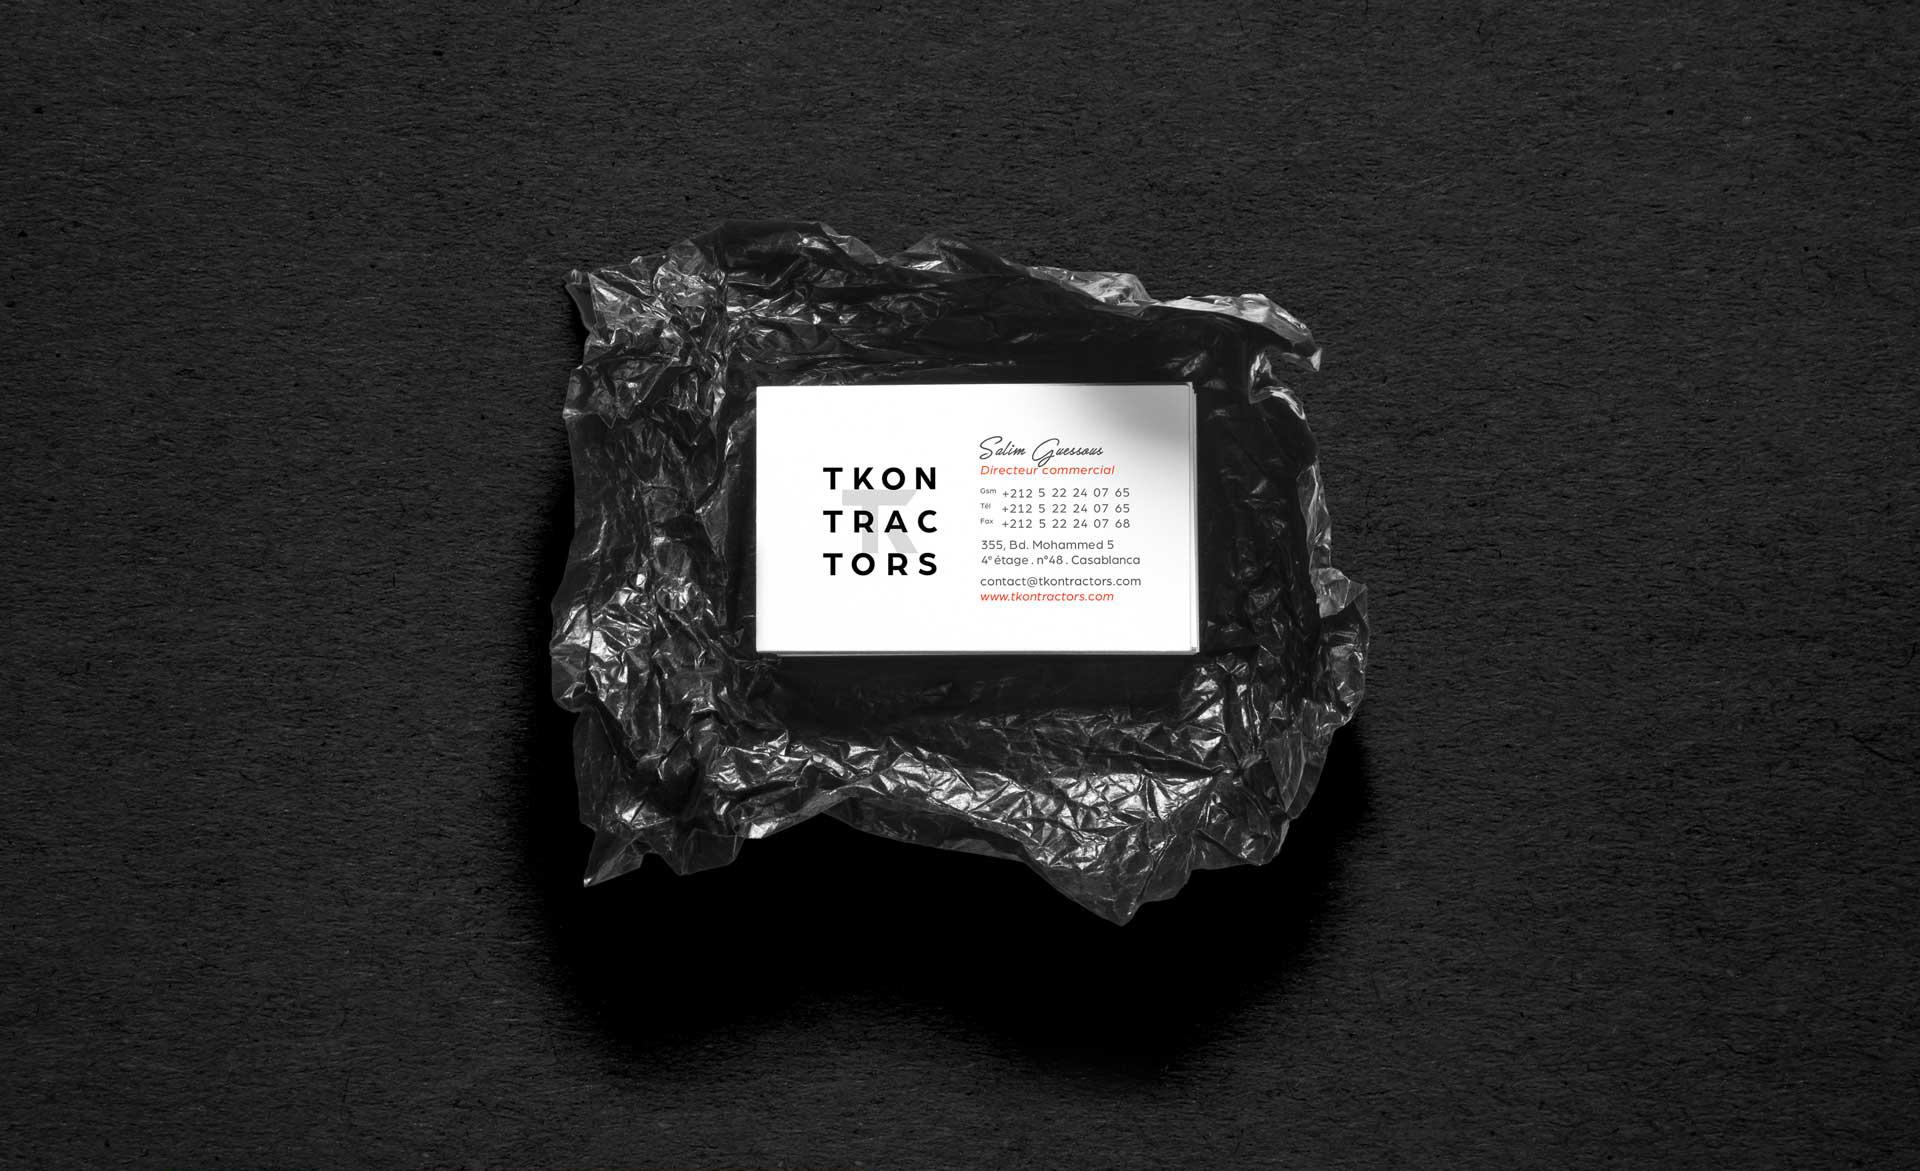 Tkontractors-Business-Cards-Mouhtadi-Design